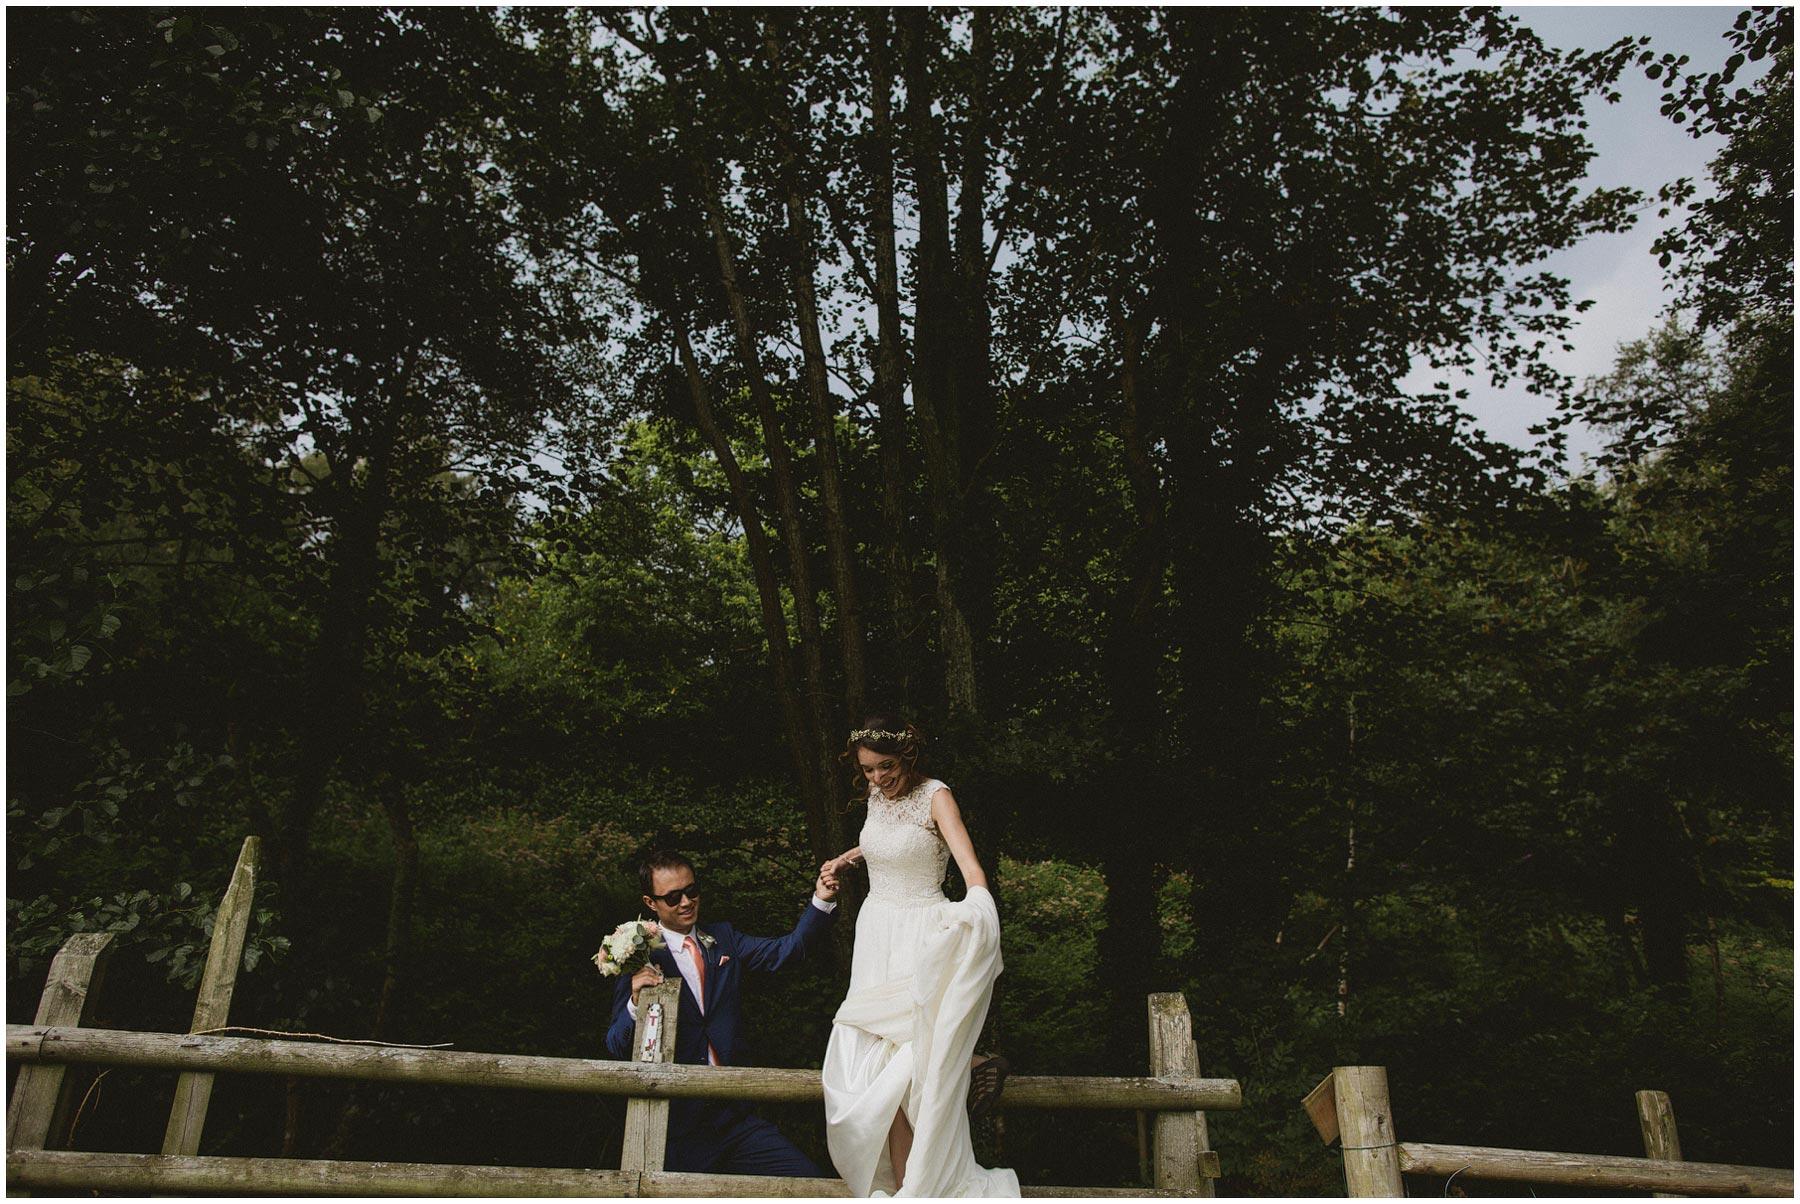 Colehayes-Park-Wedding-Photography_0145